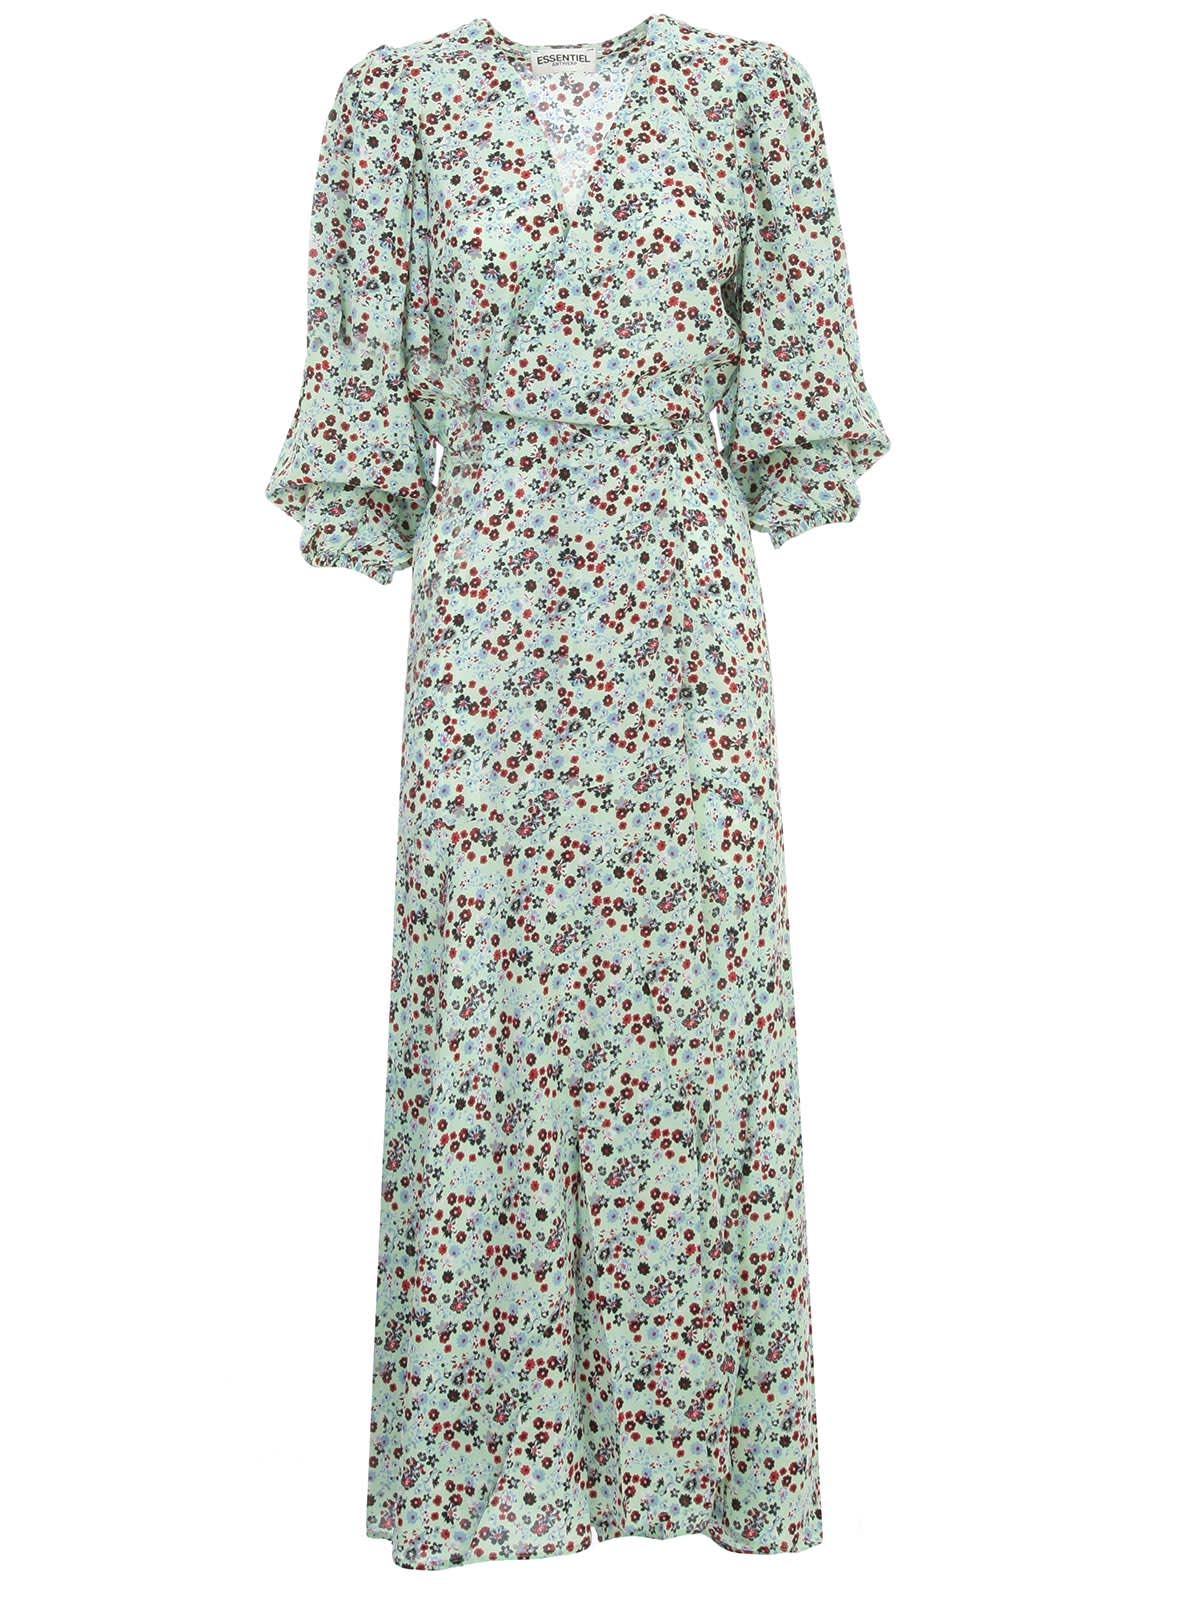 Buy Essentiel Antwerp Vip Long Wrap Dress L/s online, shop Essentiel Antwerp with free shipping